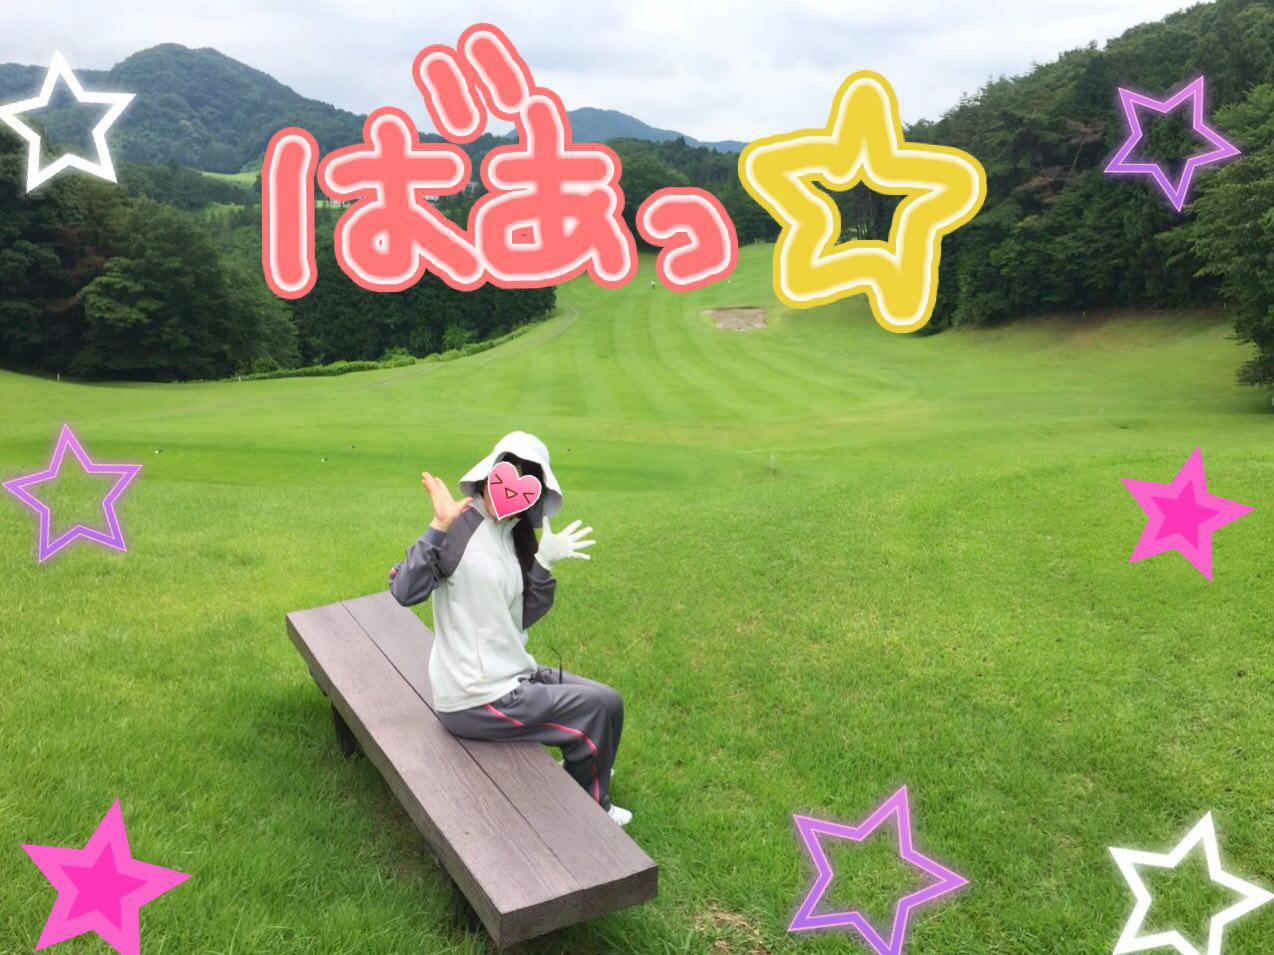 photo_2017-07-03_22-48-26.jpg